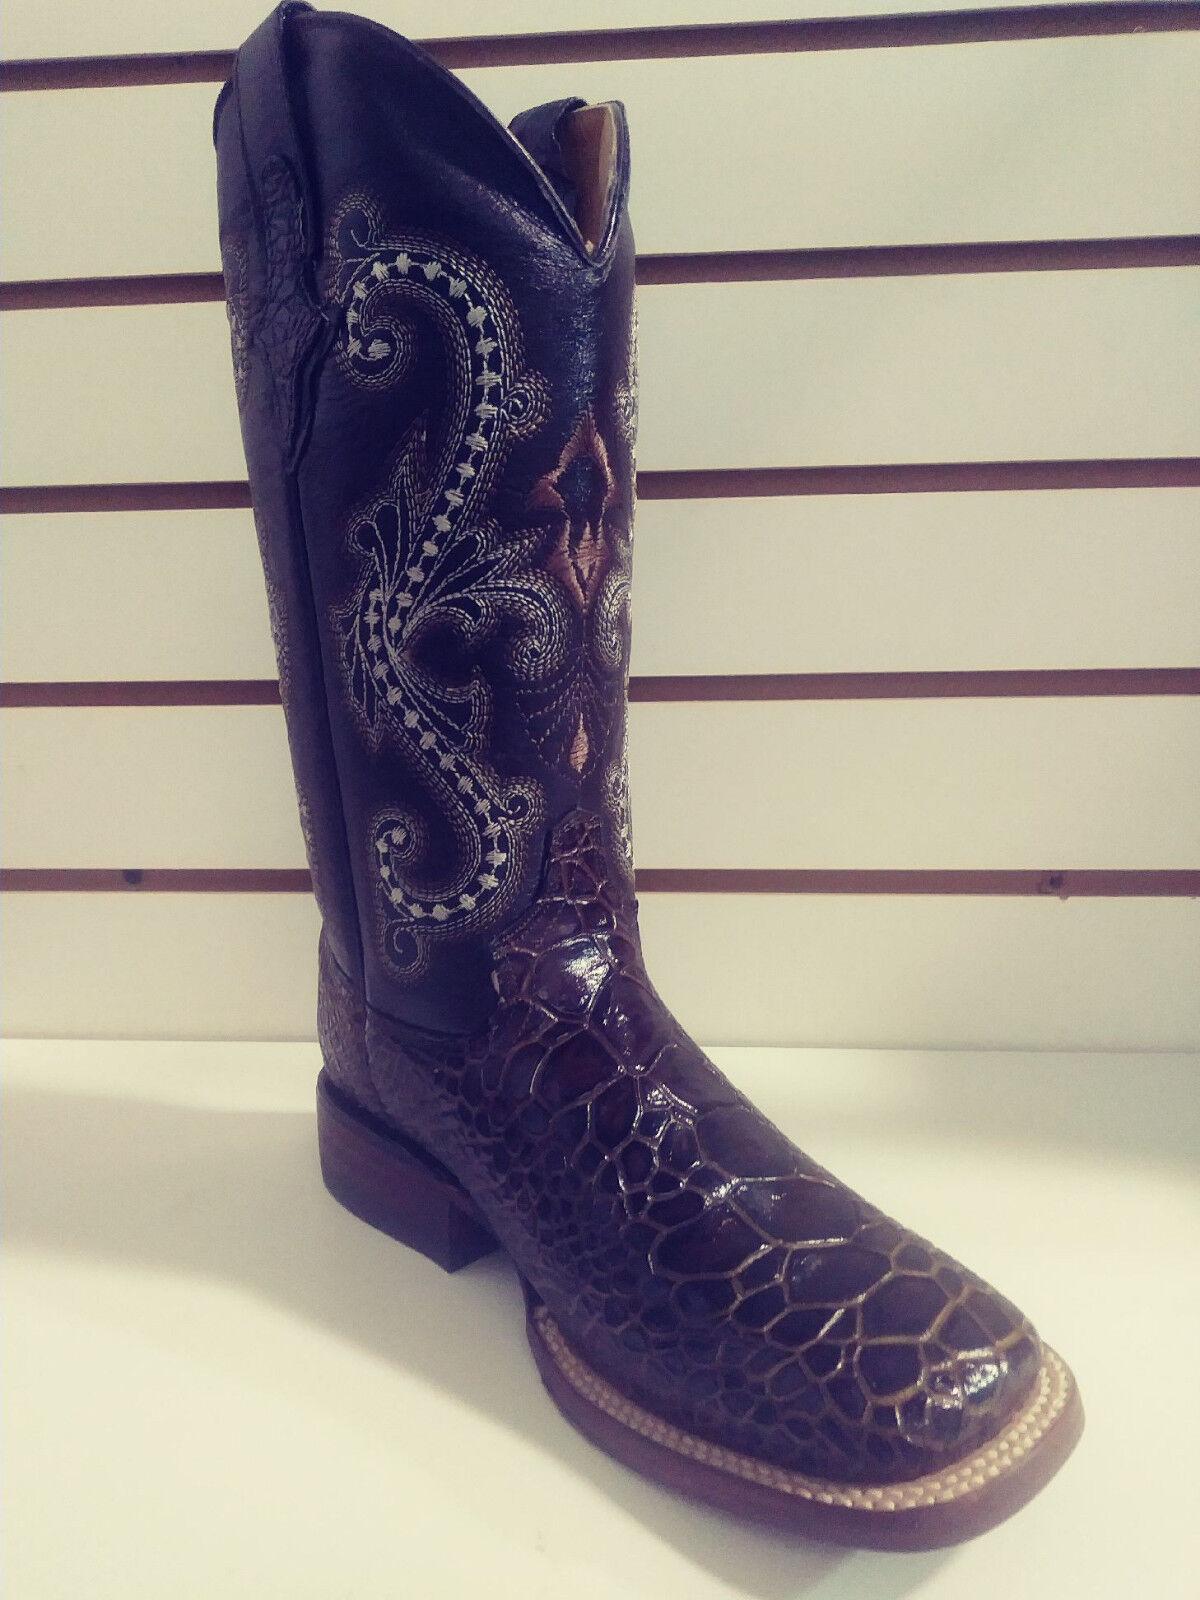 New Ferrini Womens Leather Cowboy Cowboy Cowboy Western Print Sea Turtle Boot bluee Sq Toe 6 a0b421